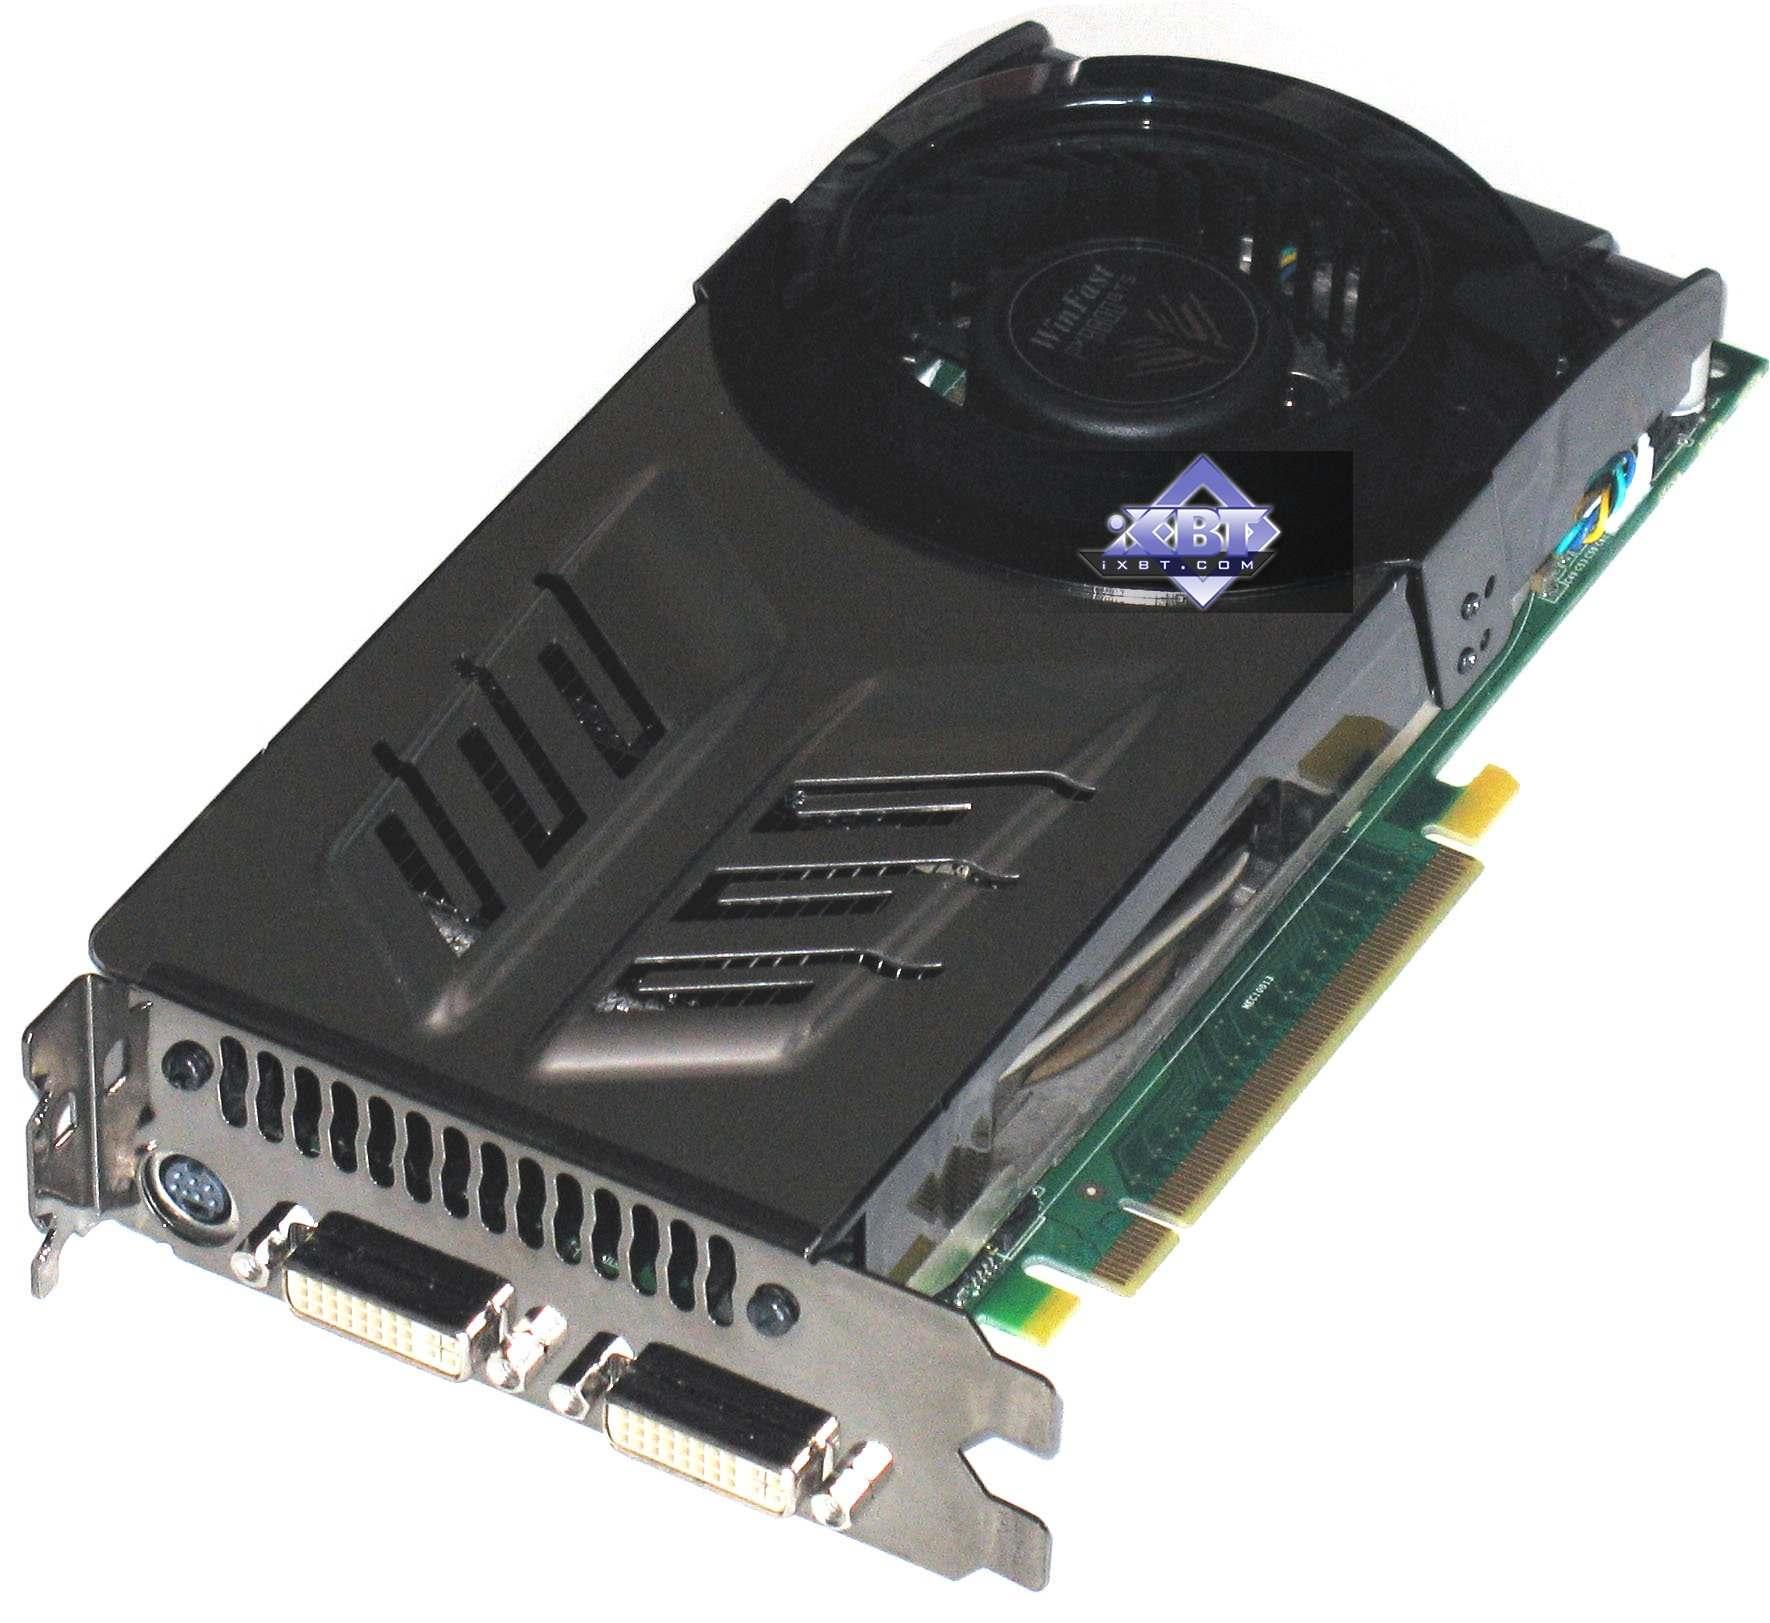 E-geforce 8800 gts